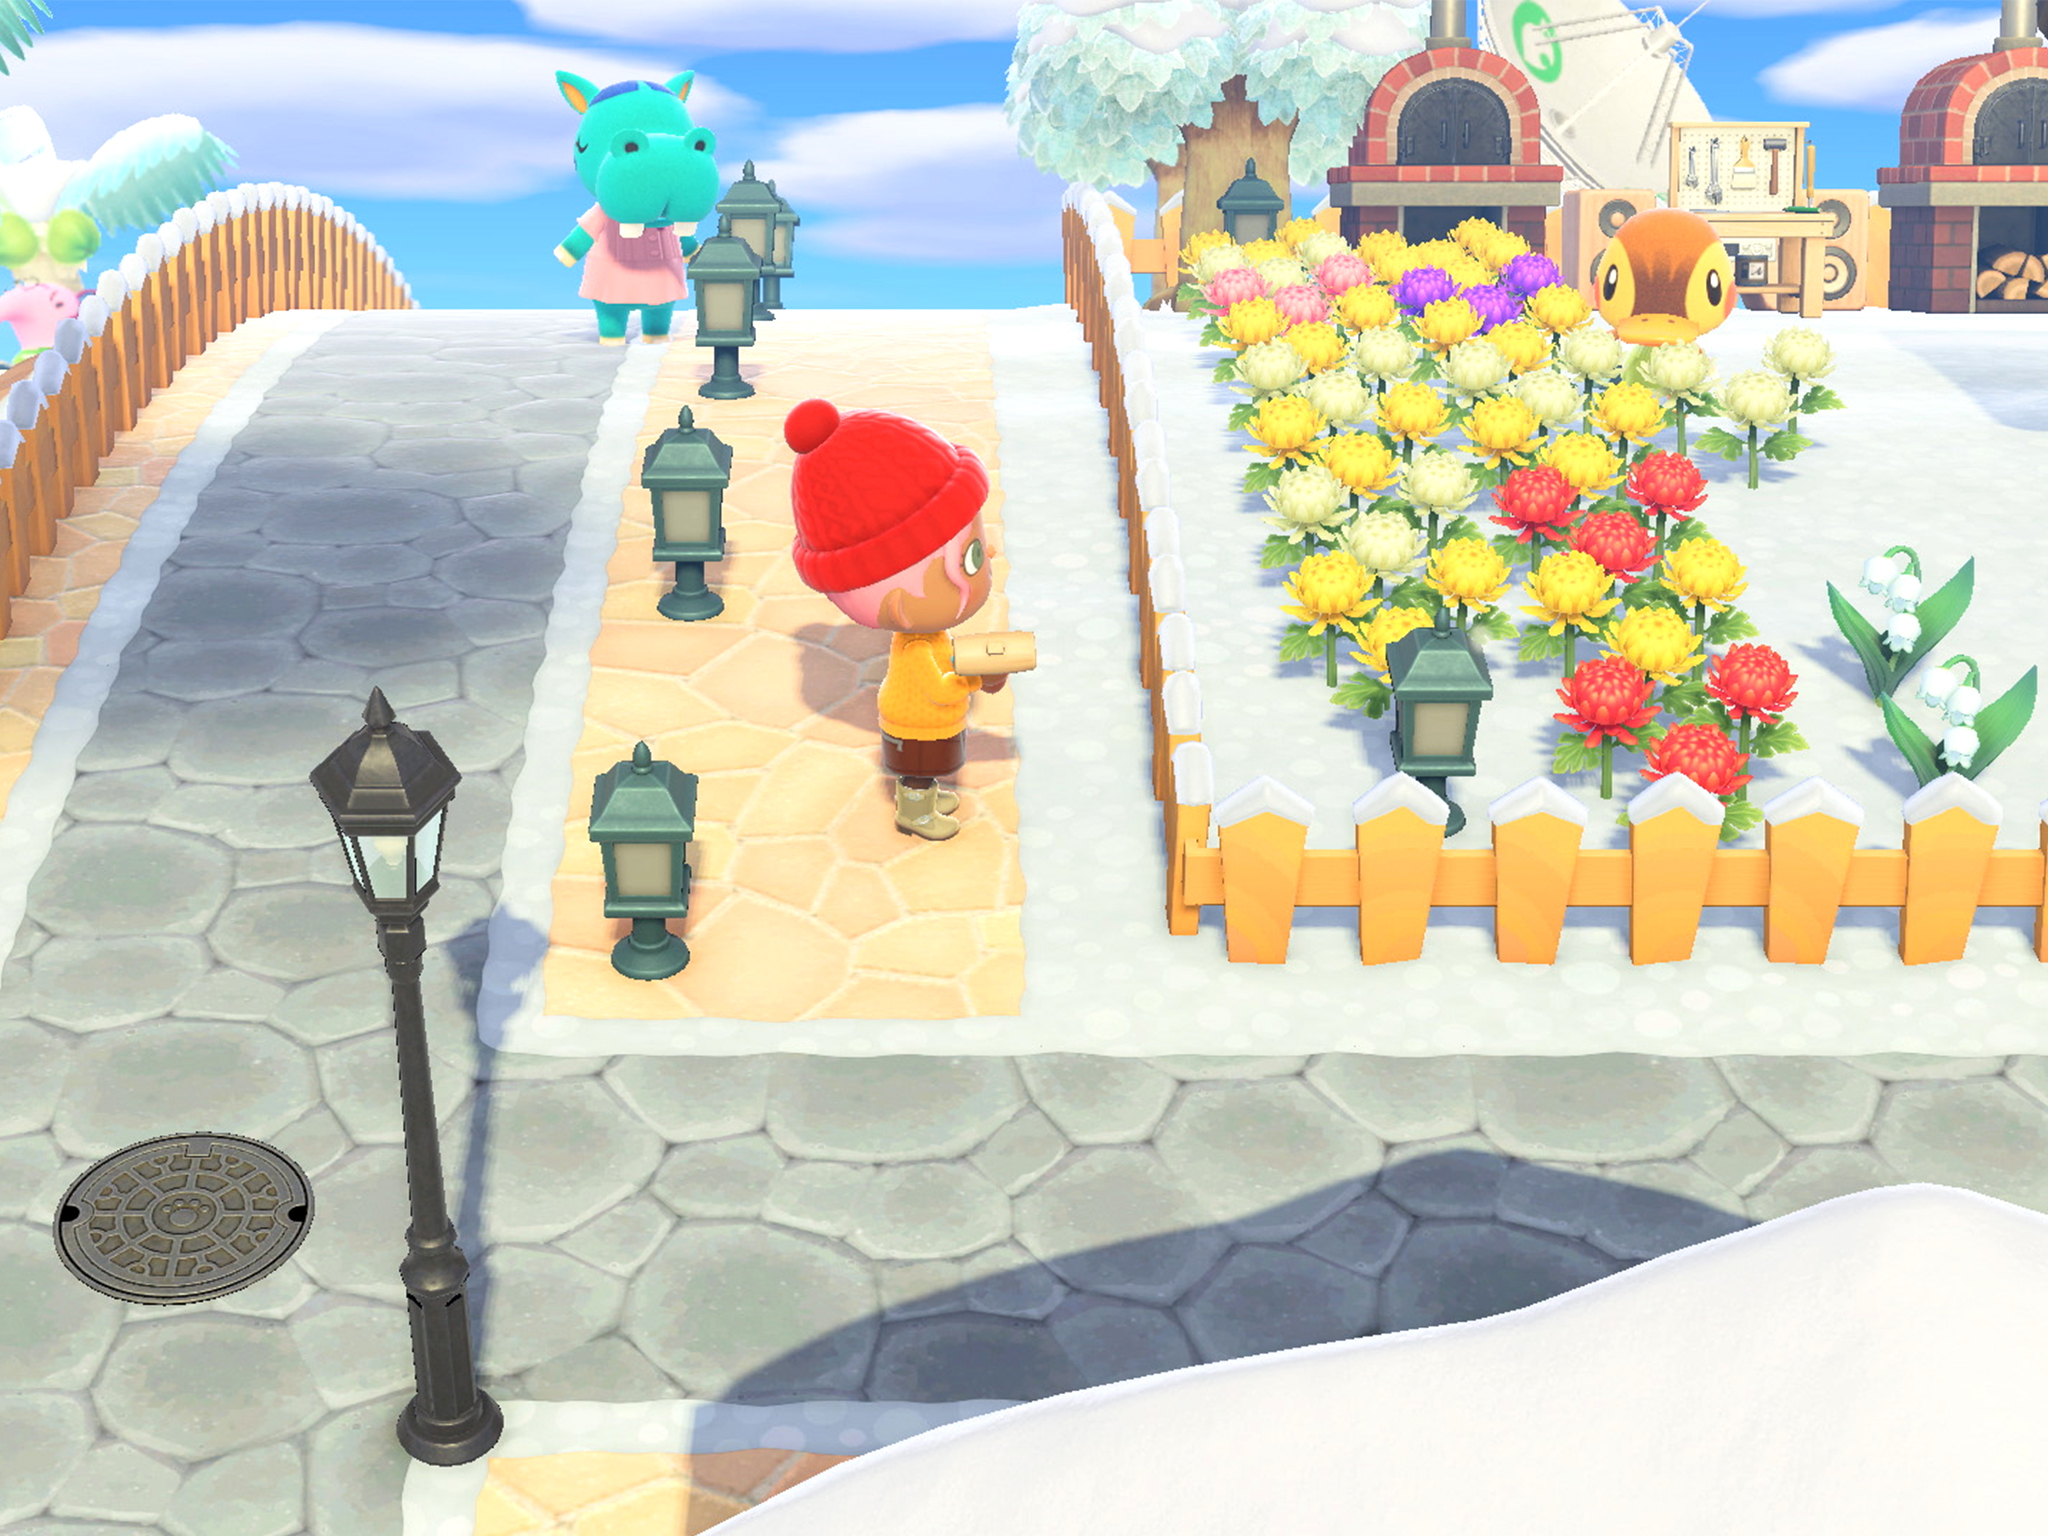 Entretenimento, Videojogos, Animal Crossing: New Horizons